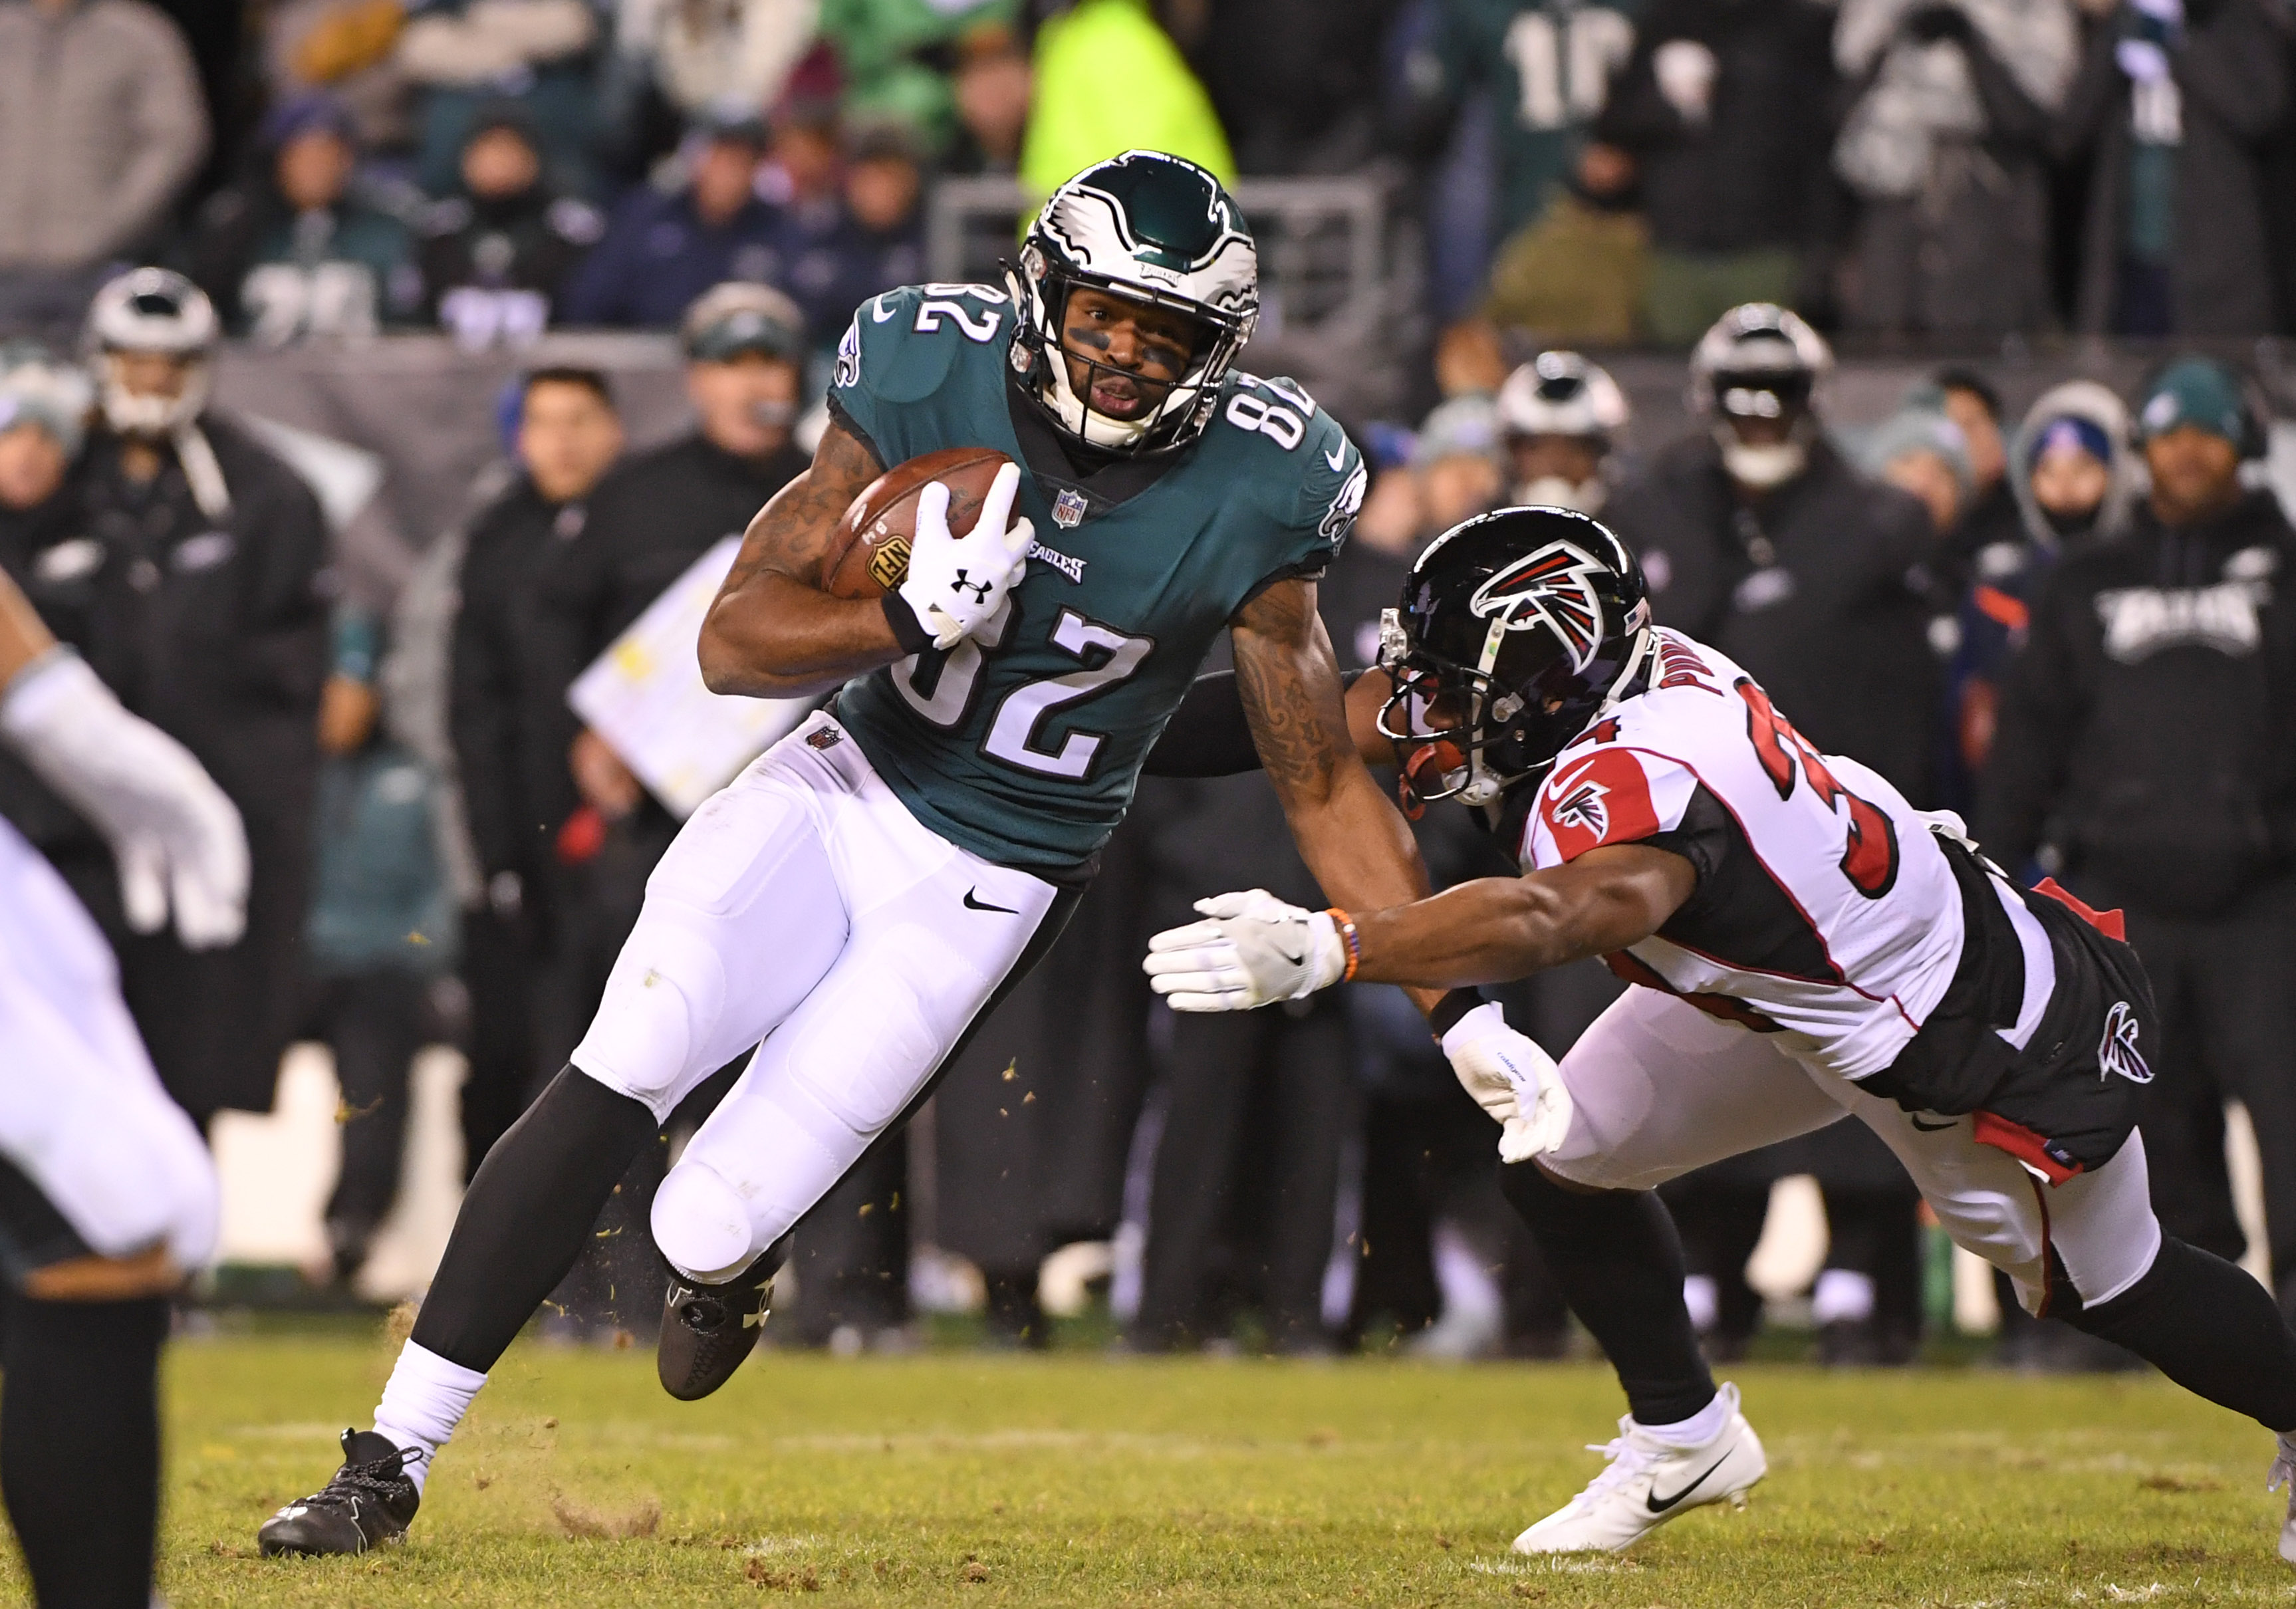 Jason La Canfora likes the Eagles to upset Falcons